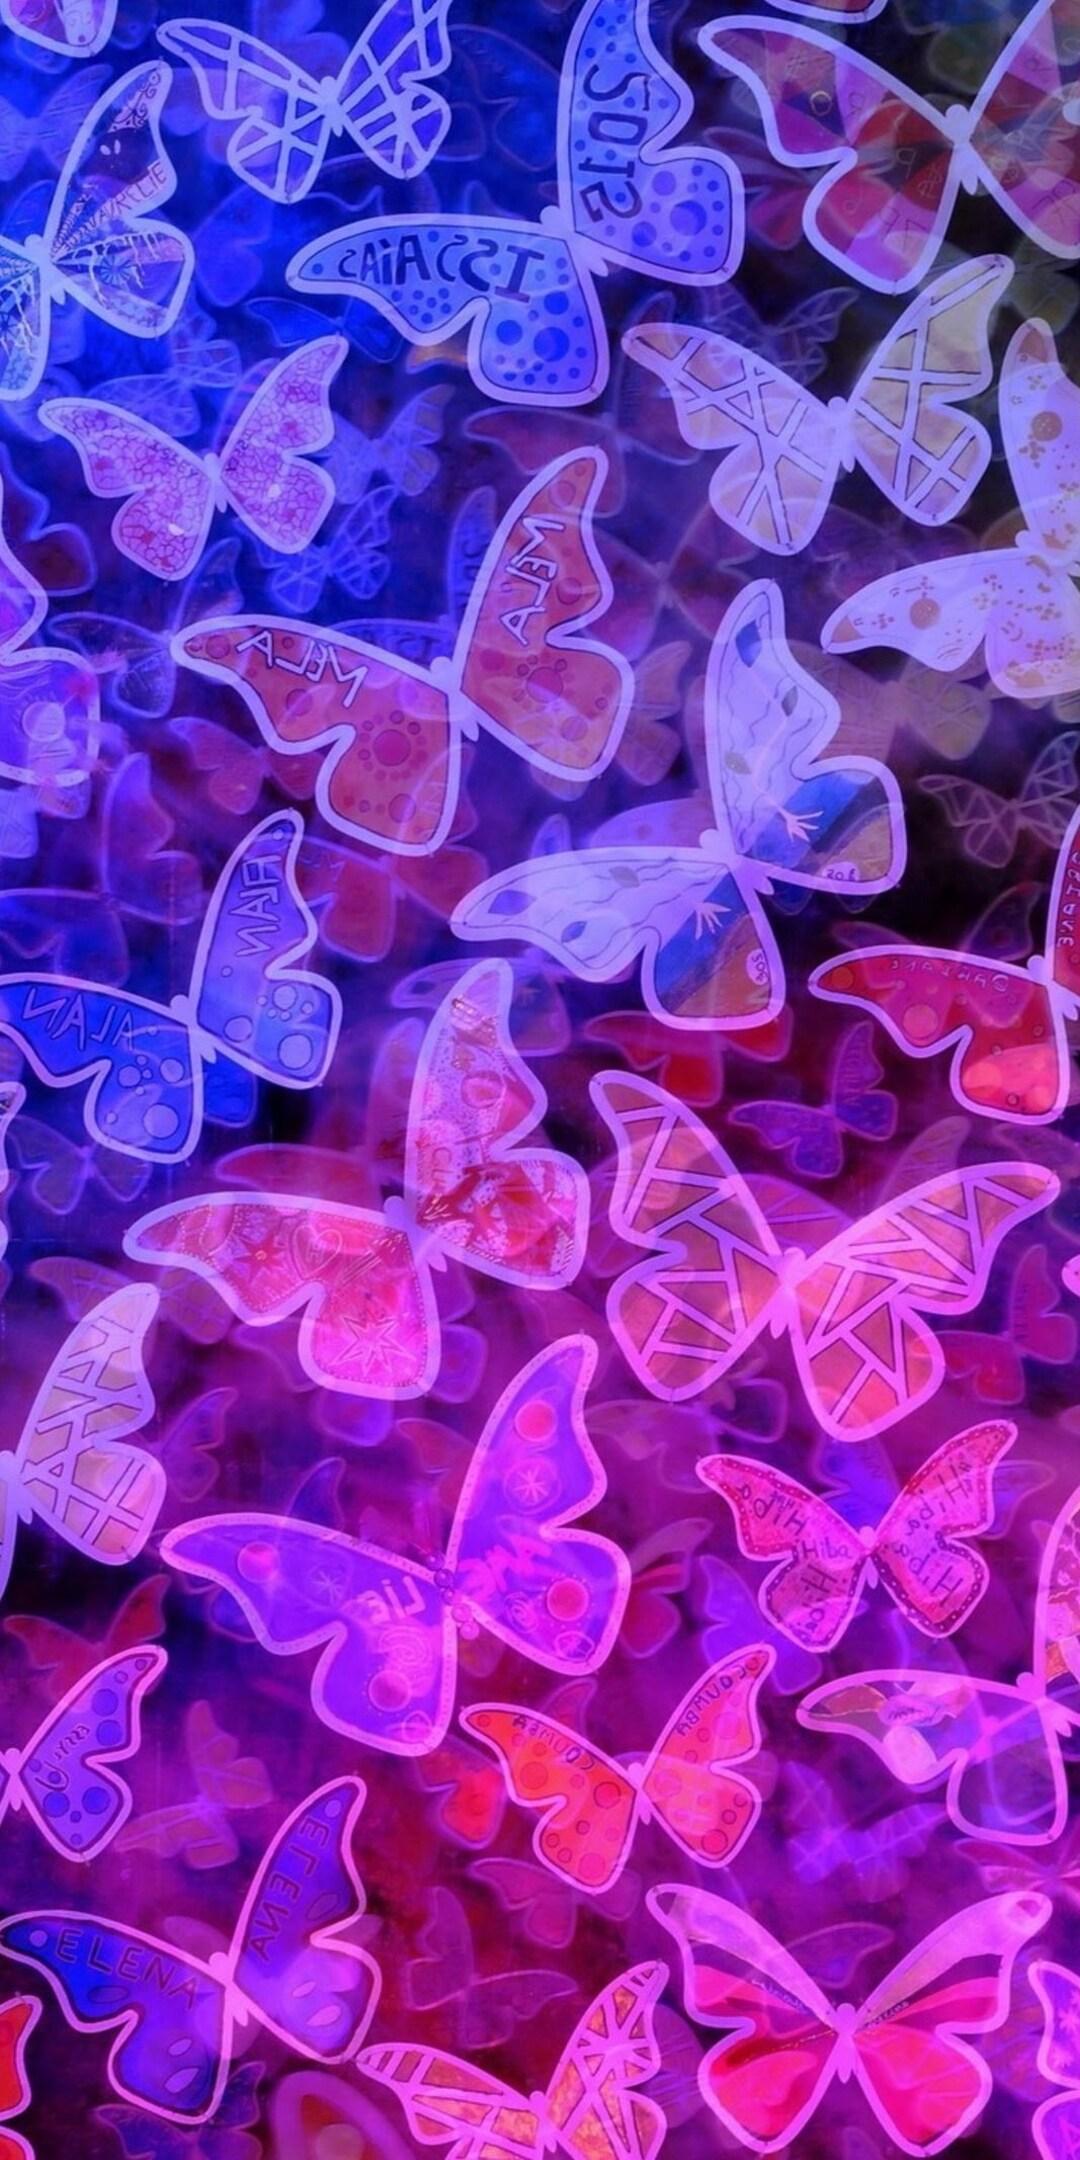 butterfly-background.jpg